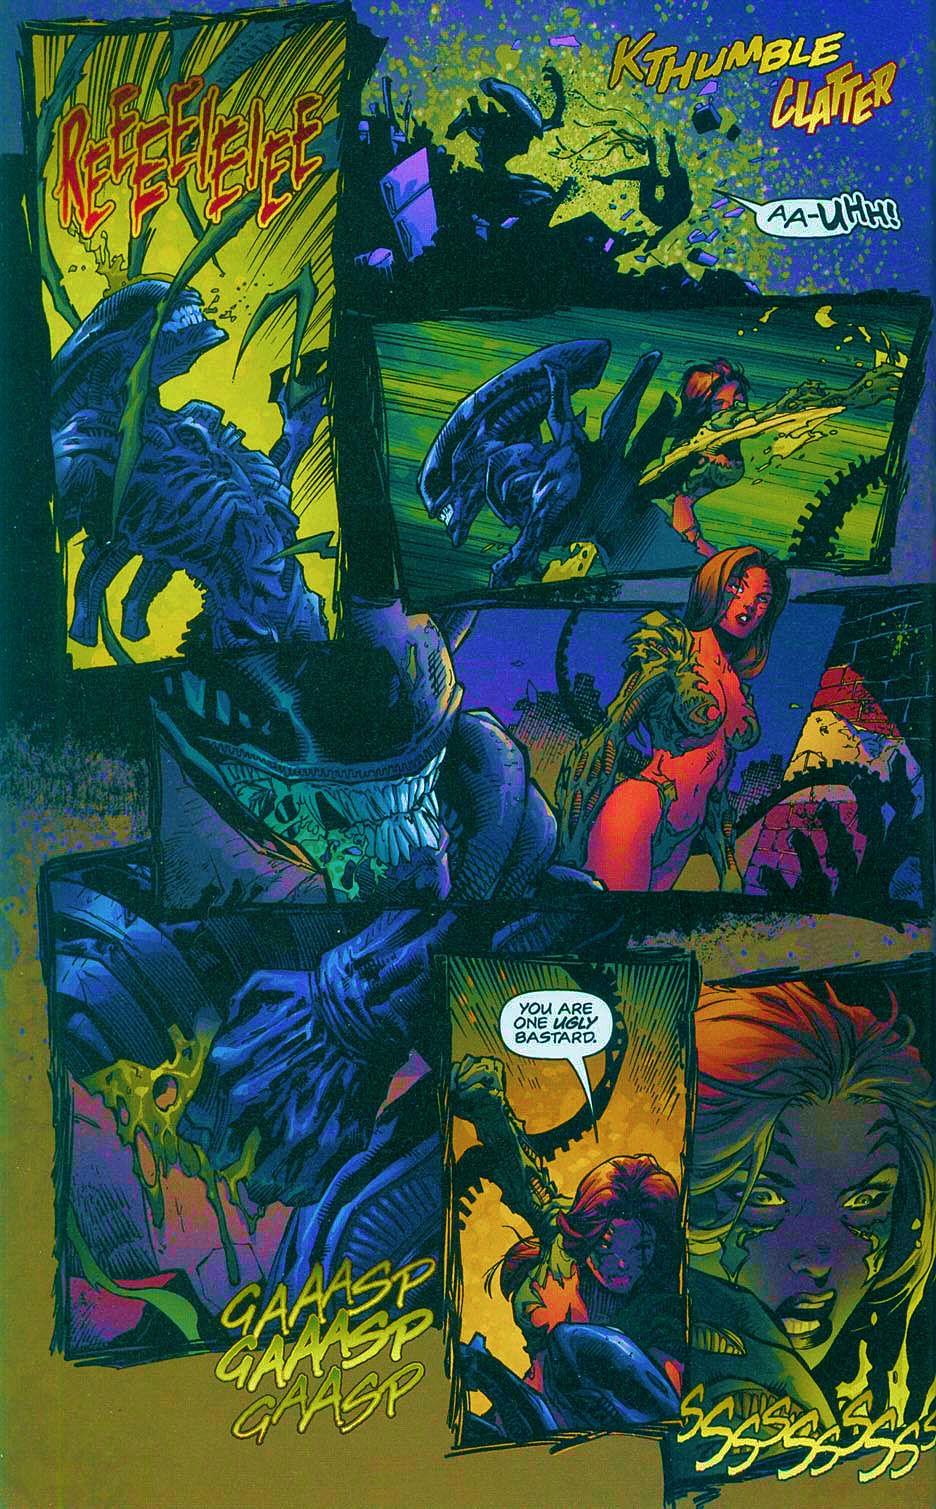 Read online Overkill: Witchblade/Aliens/Darkness/Predator comic -  Issue #2 - 21